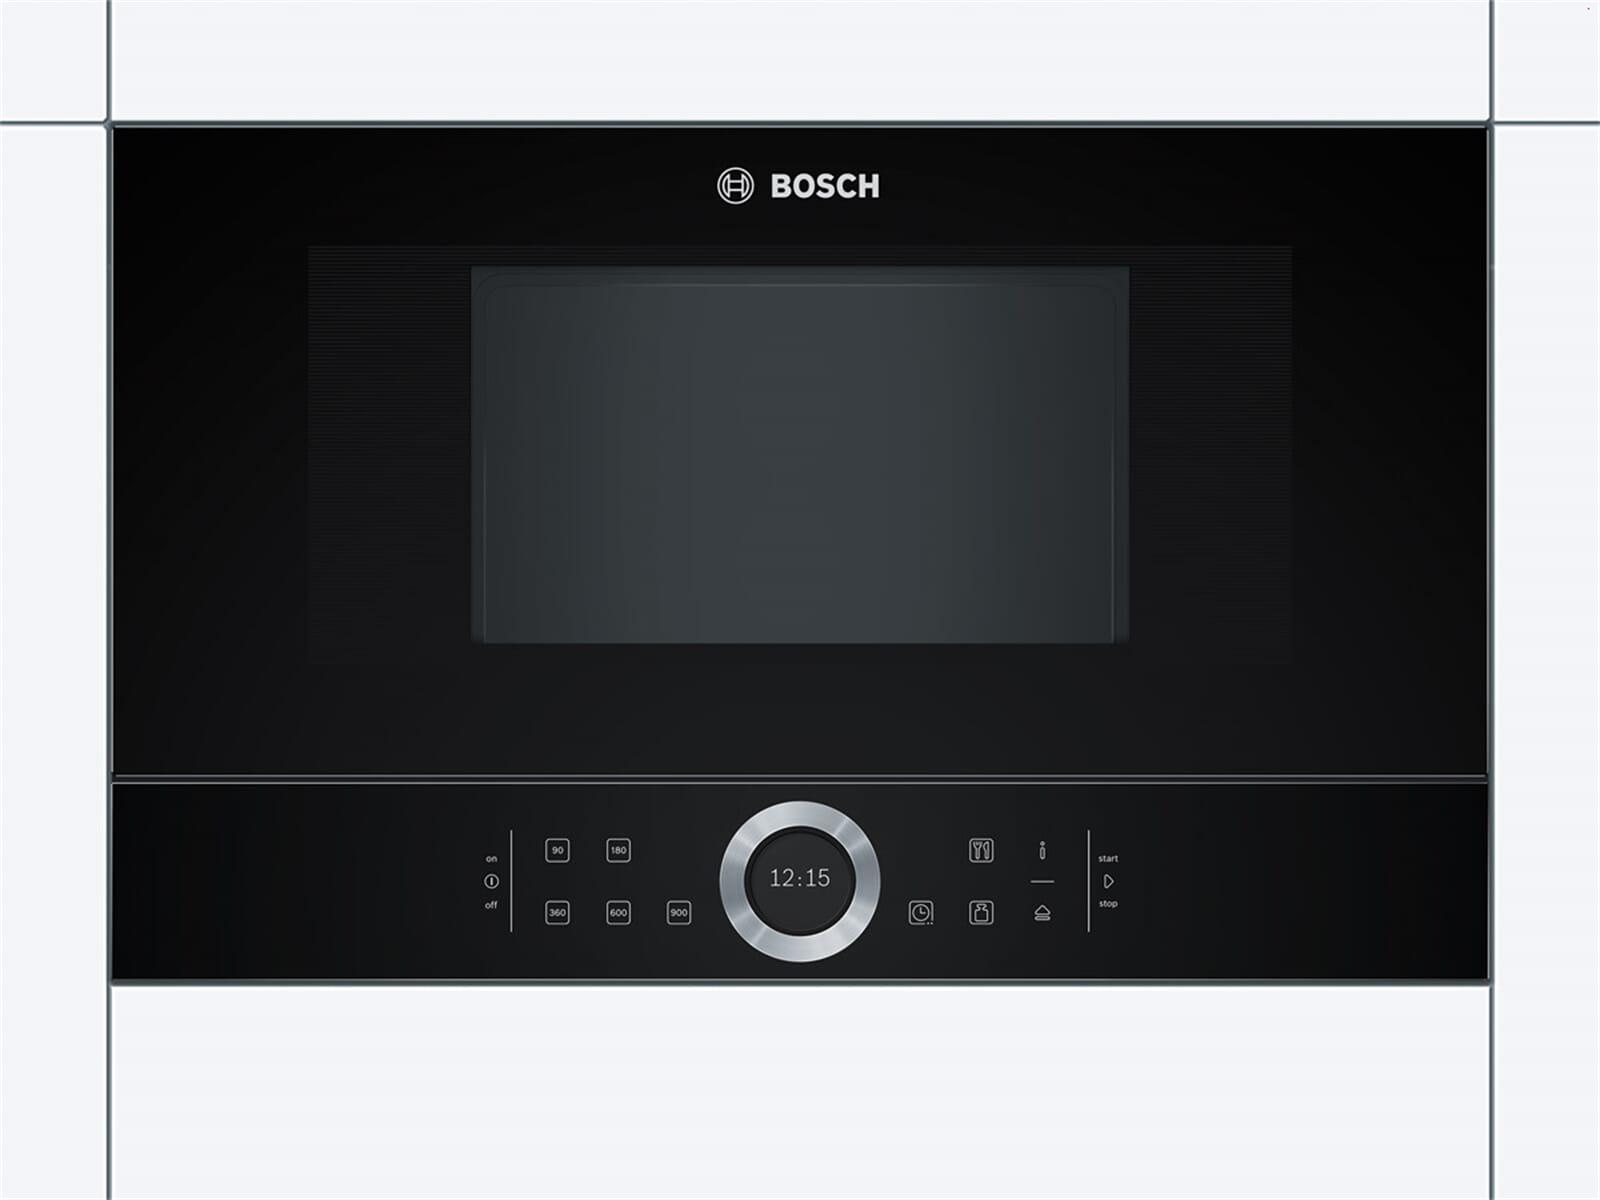 Bosch BFR634GB1 Einbau-Mikrowelle Vulkan schwarz